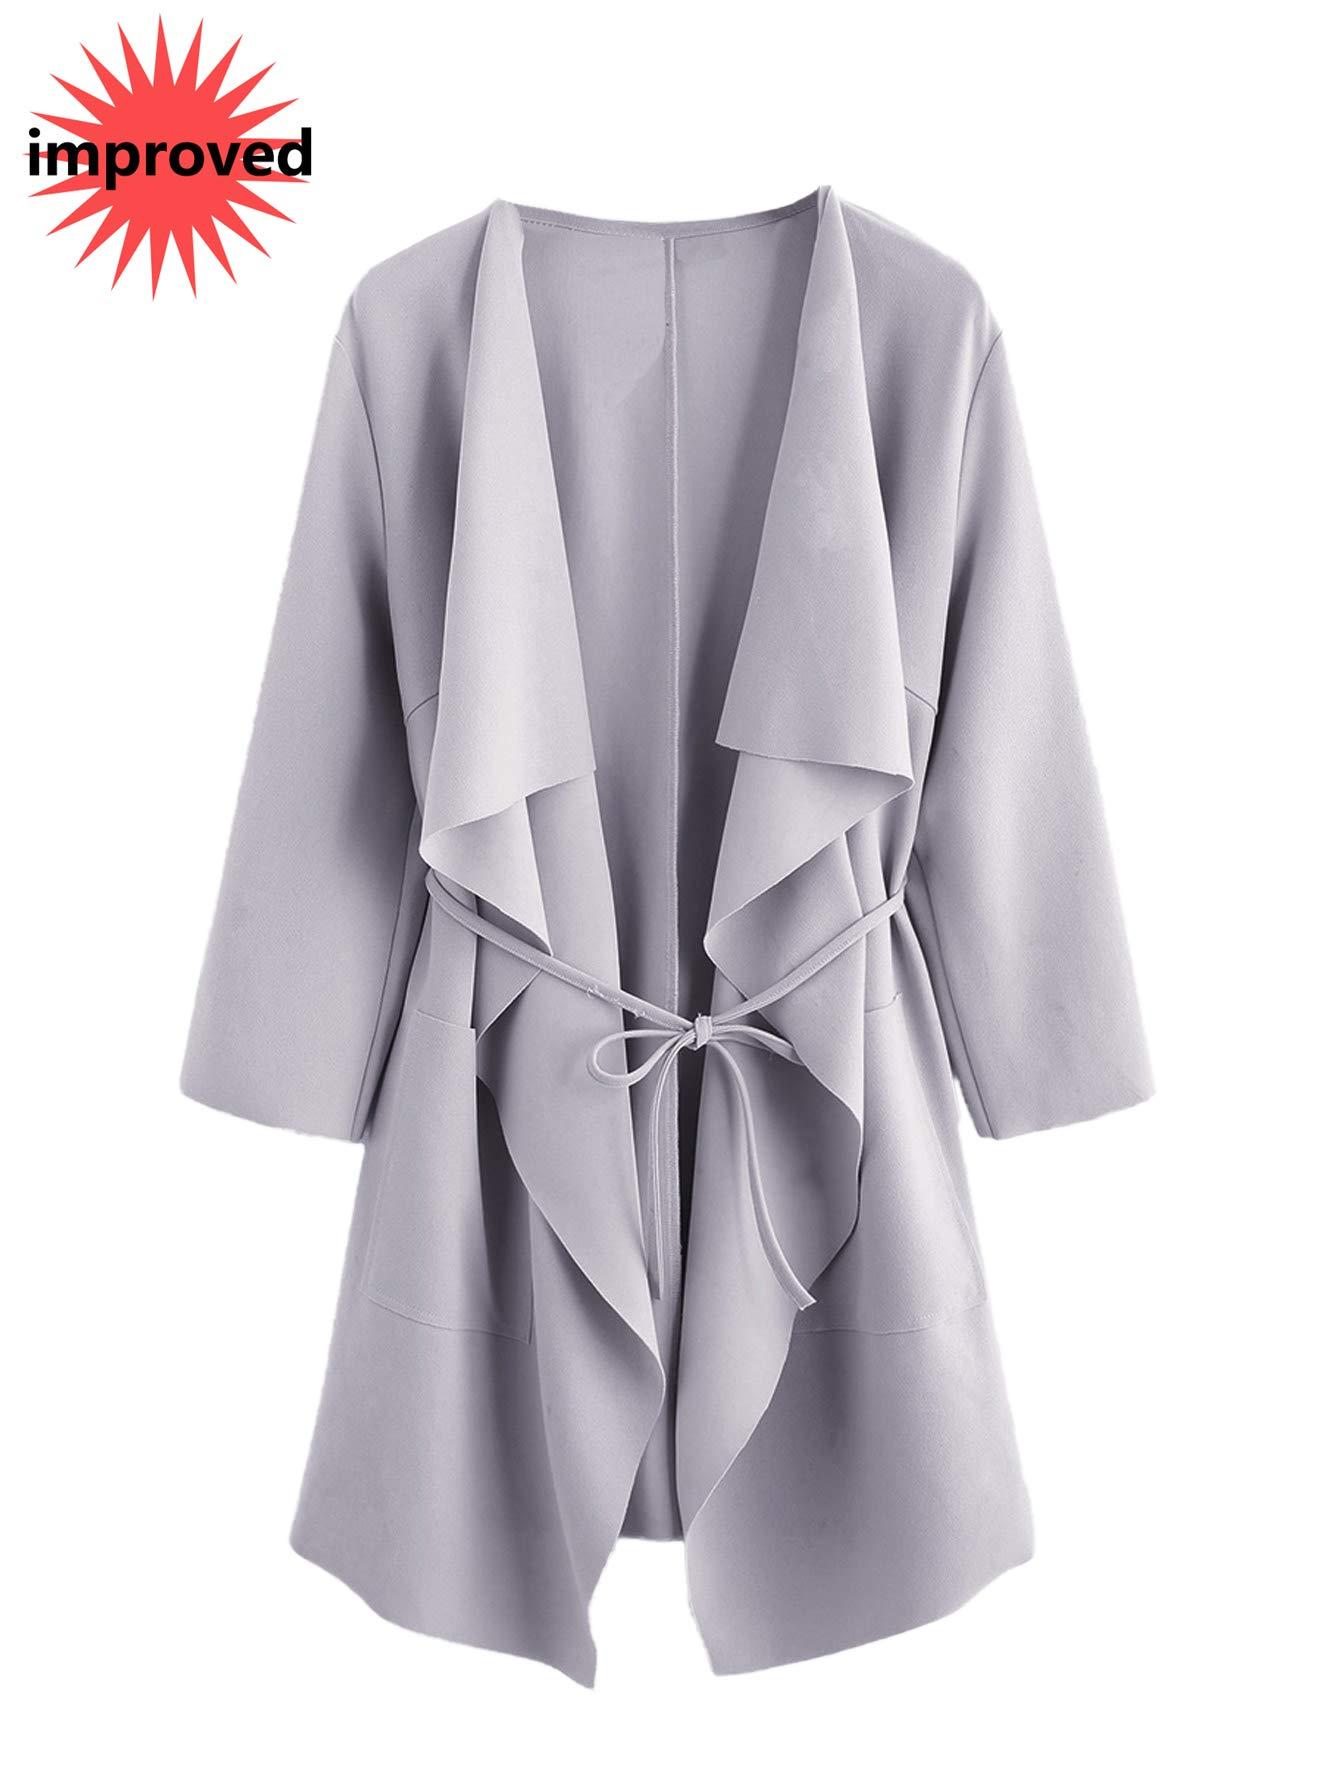 Romwe Women's Raw Cut Hem Waterfall Collar Long Sleeve Wrap Trench Coat Cardigan Grey S